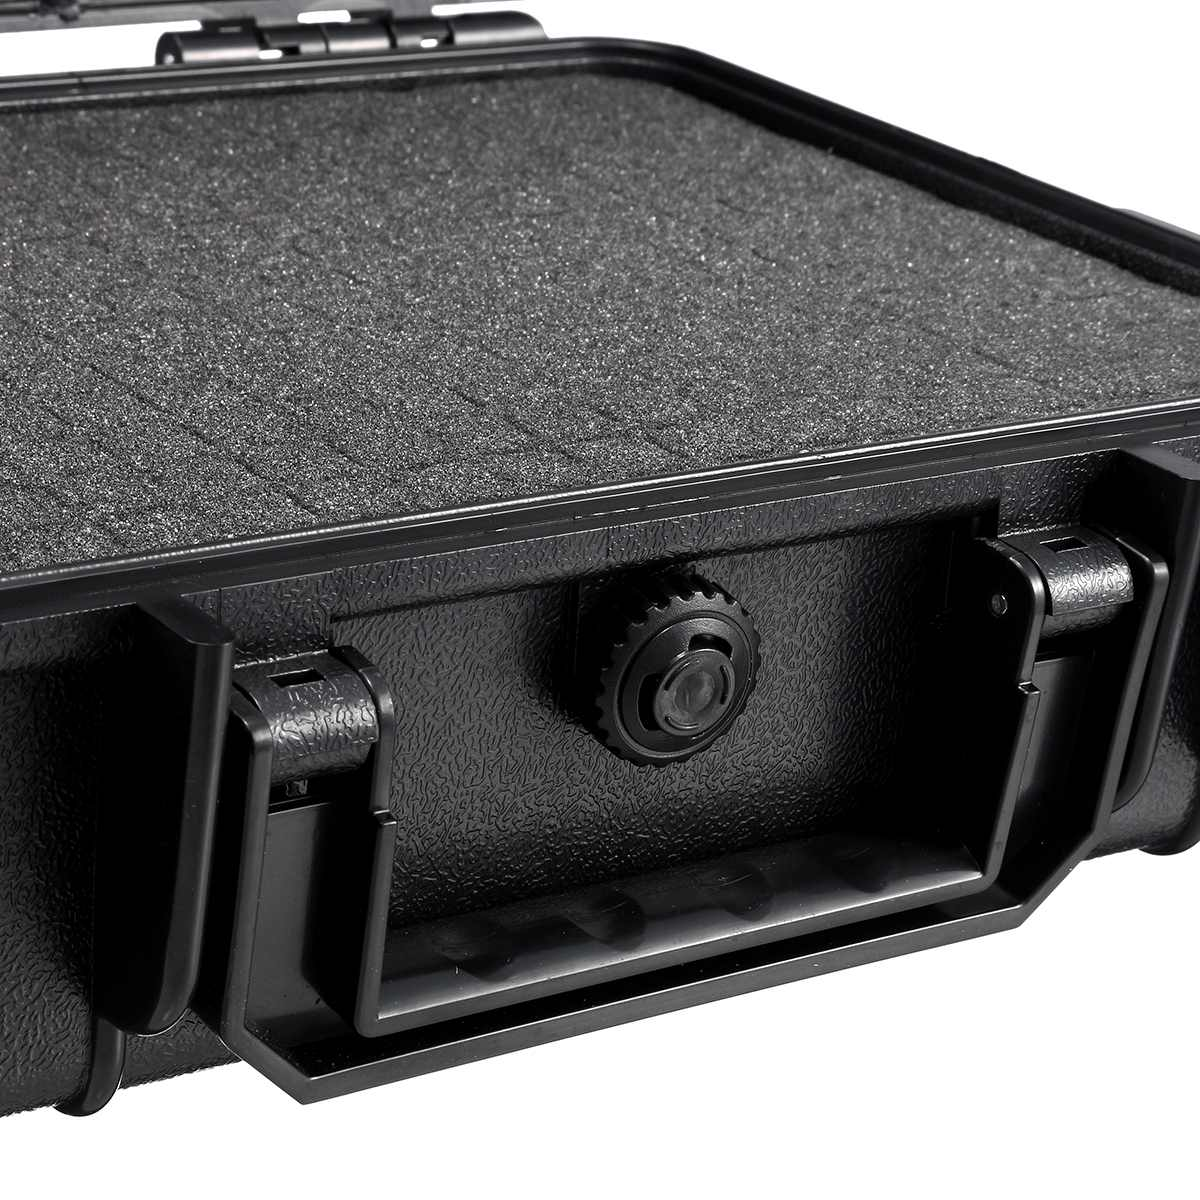 Portable Storage Box Waterproof Hard Carry Case Bag Tool Organizer W//Strap Black